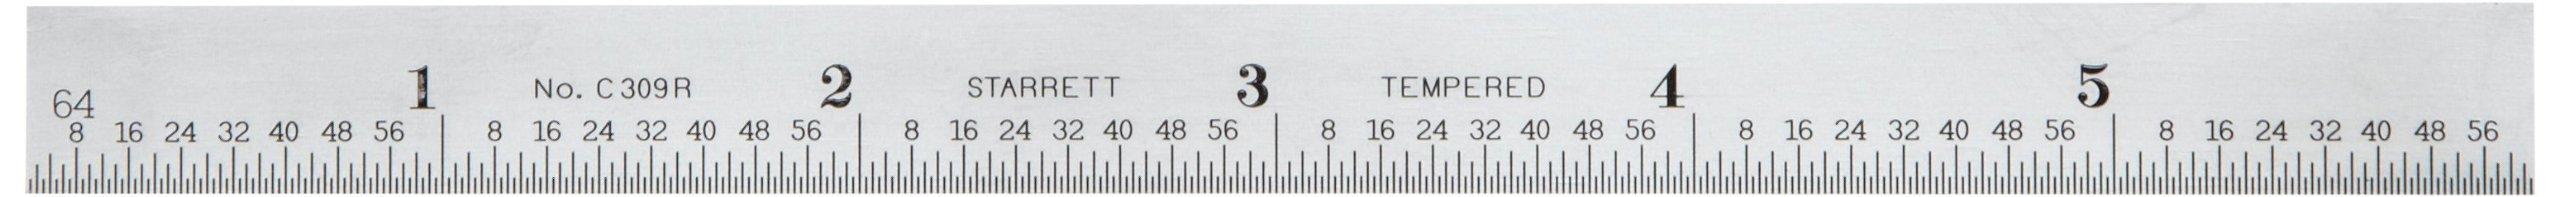 Starrett C309R-6 Full Flexible Steel Rule With Inch Graduations, 9R Graduations, 6'' Length, 1/2'' Width, 1/64'' Thickness